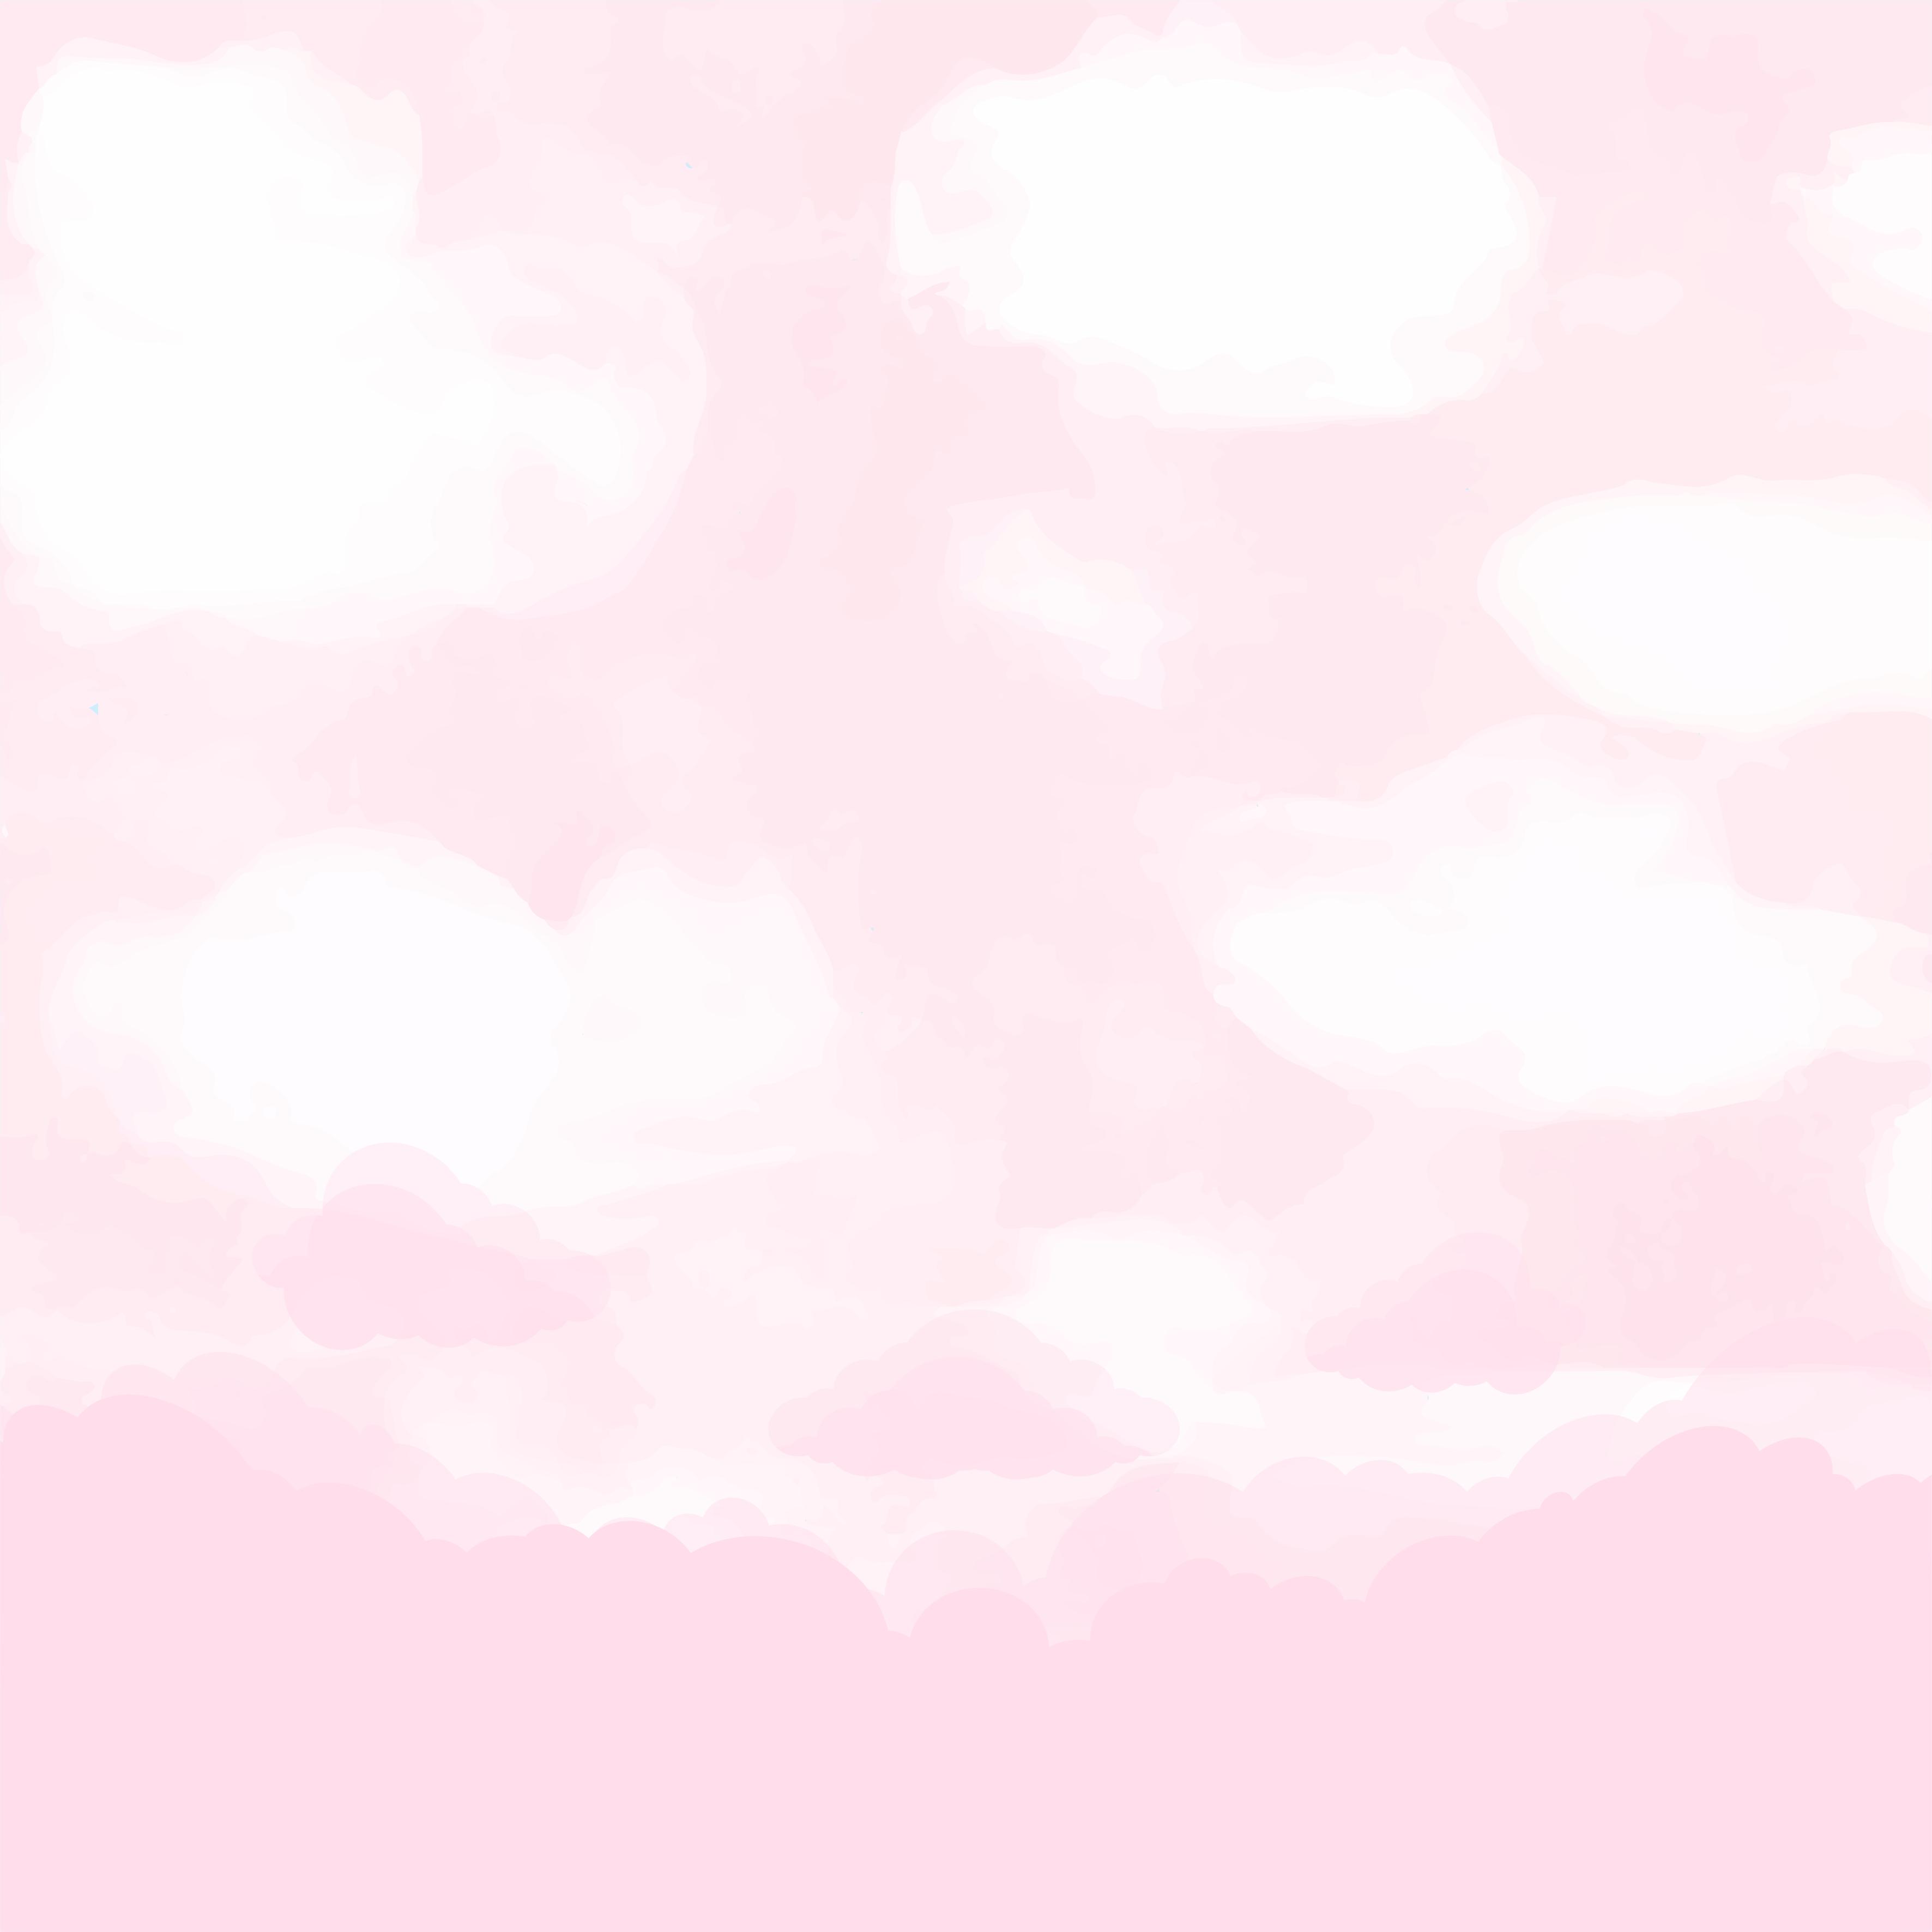 papel digital ovelhinha rosa 1